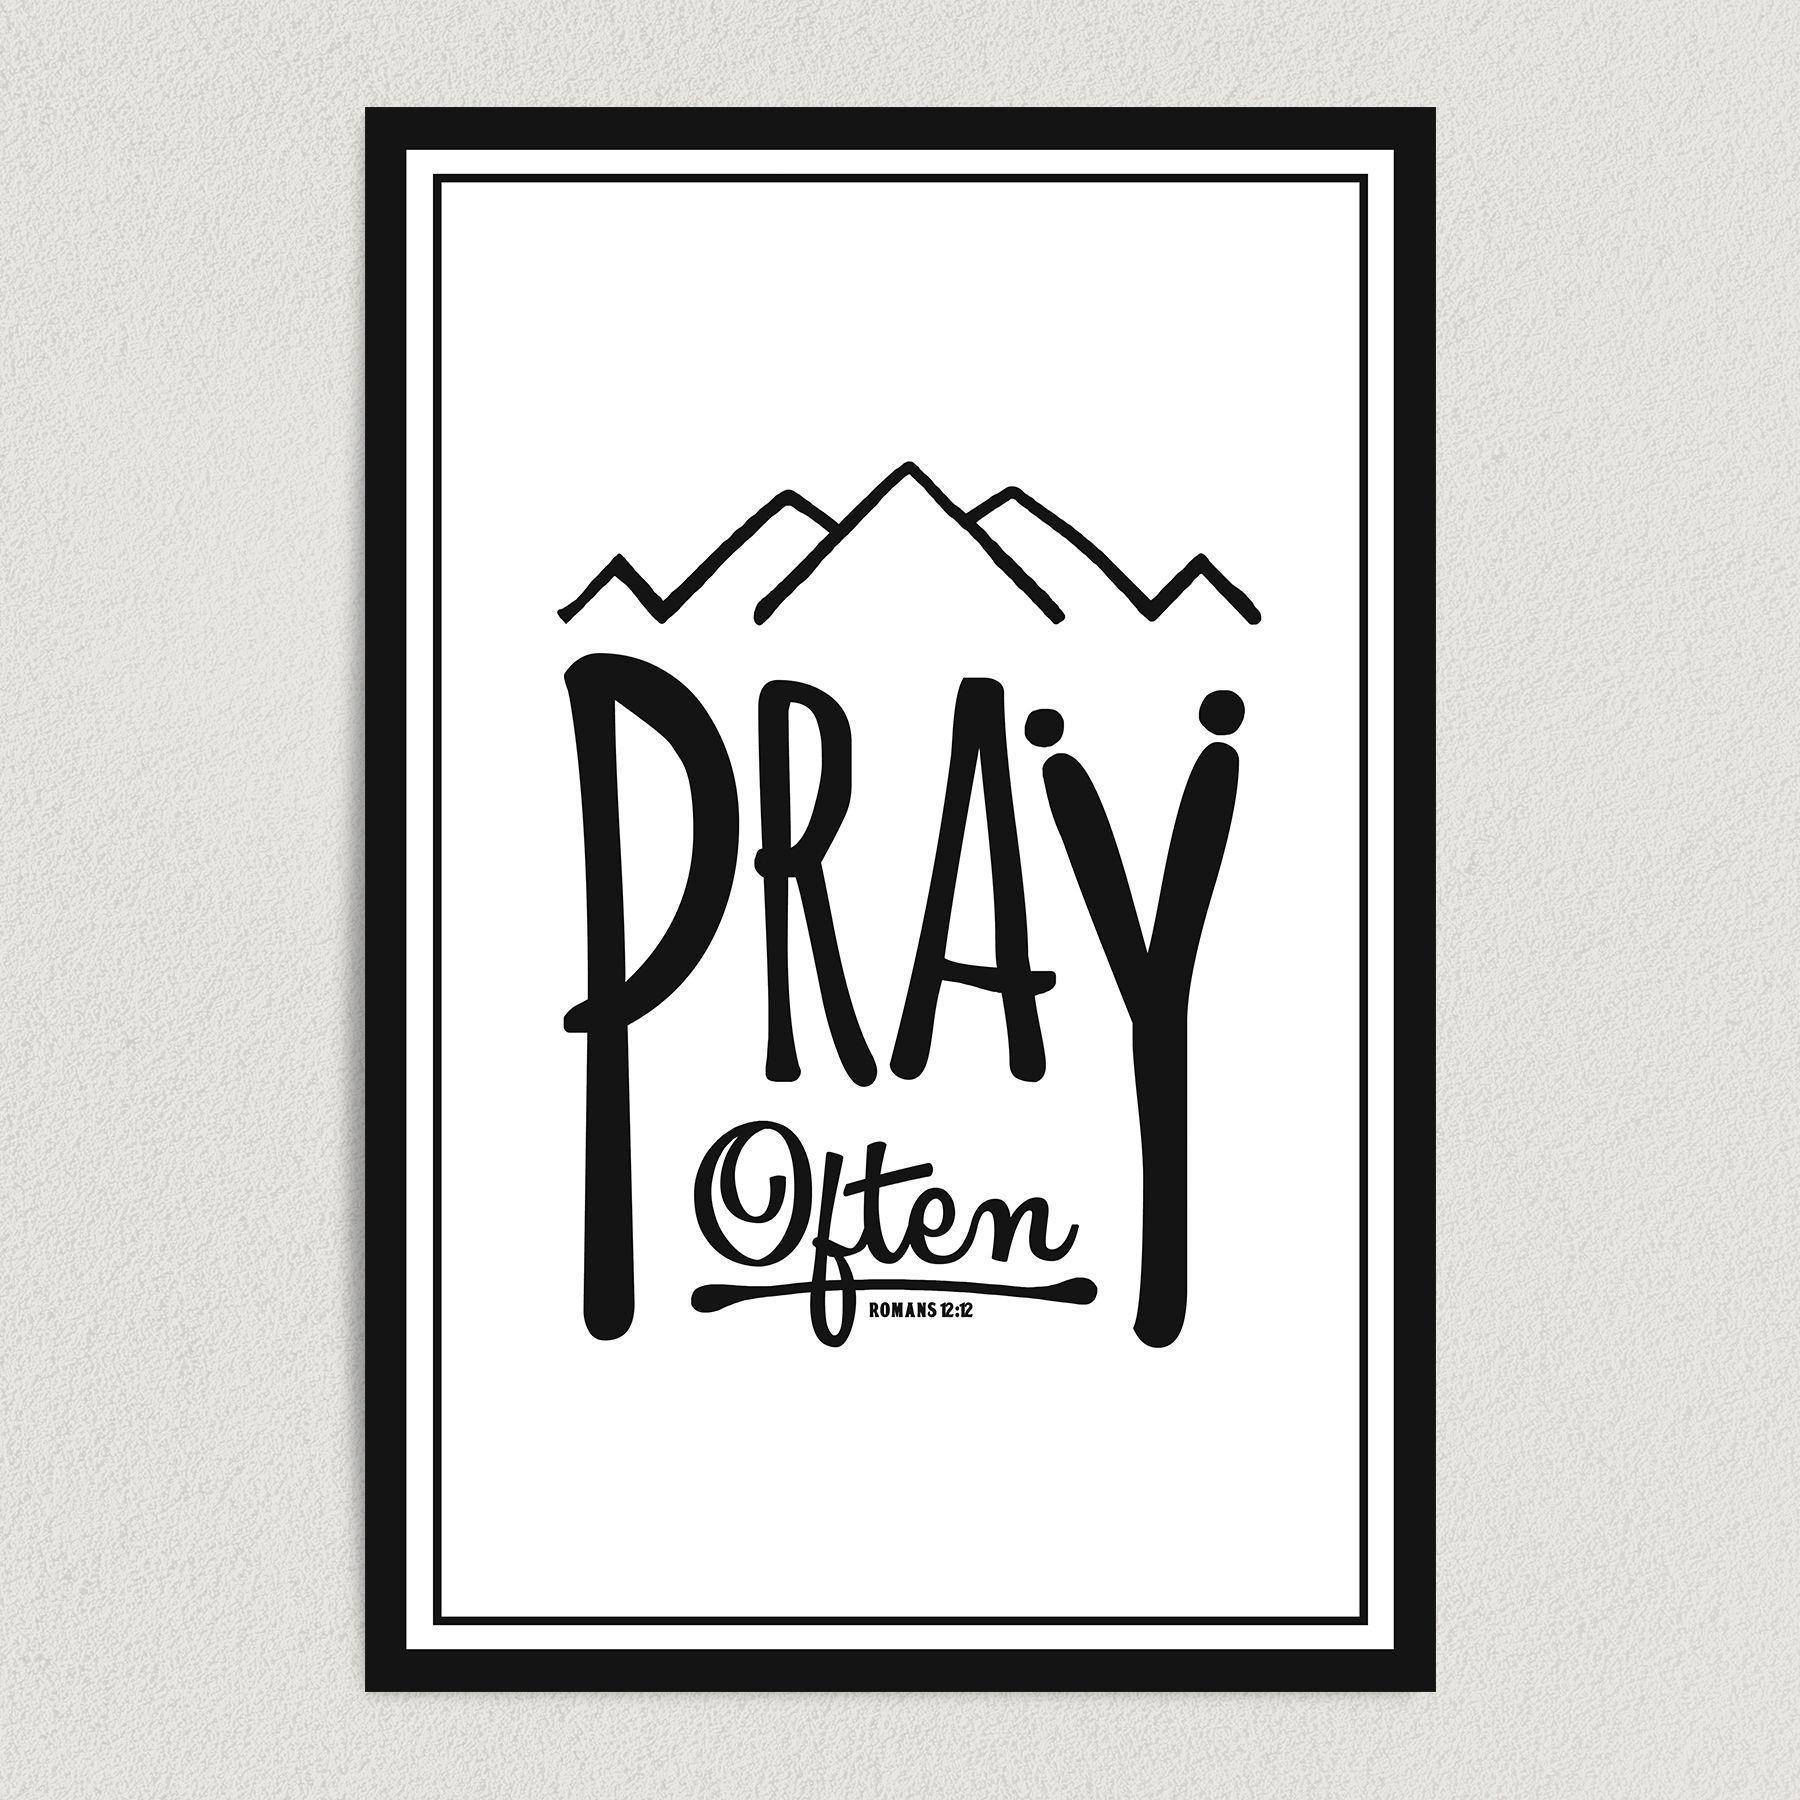 Pray Often Art Print Poster 12″ x 18″ Wall Art Print Poster RS2751